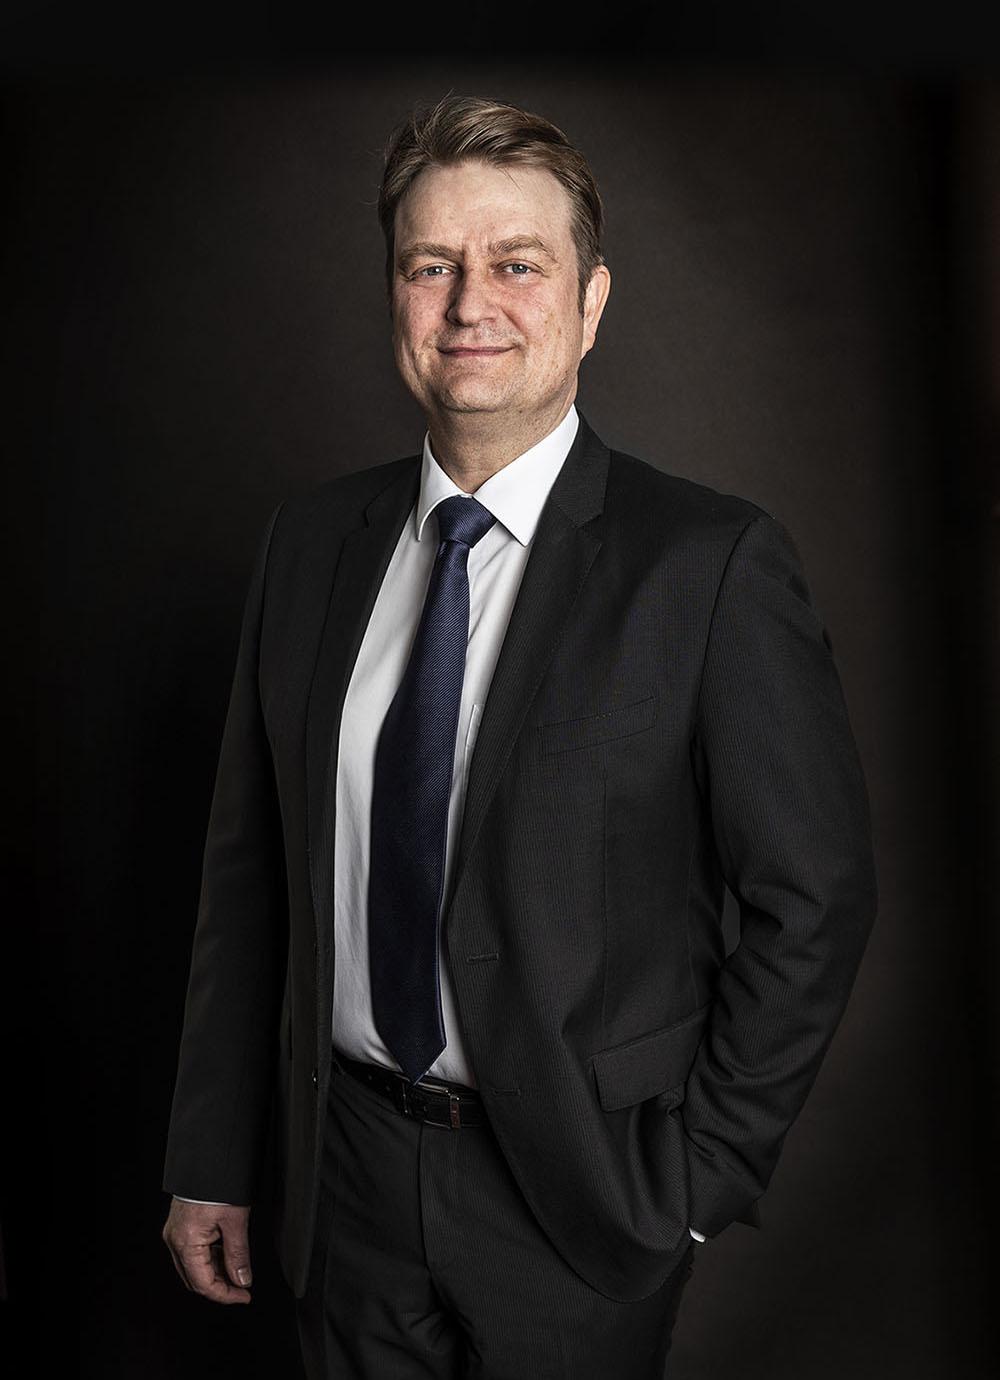 Marcus Eurskens